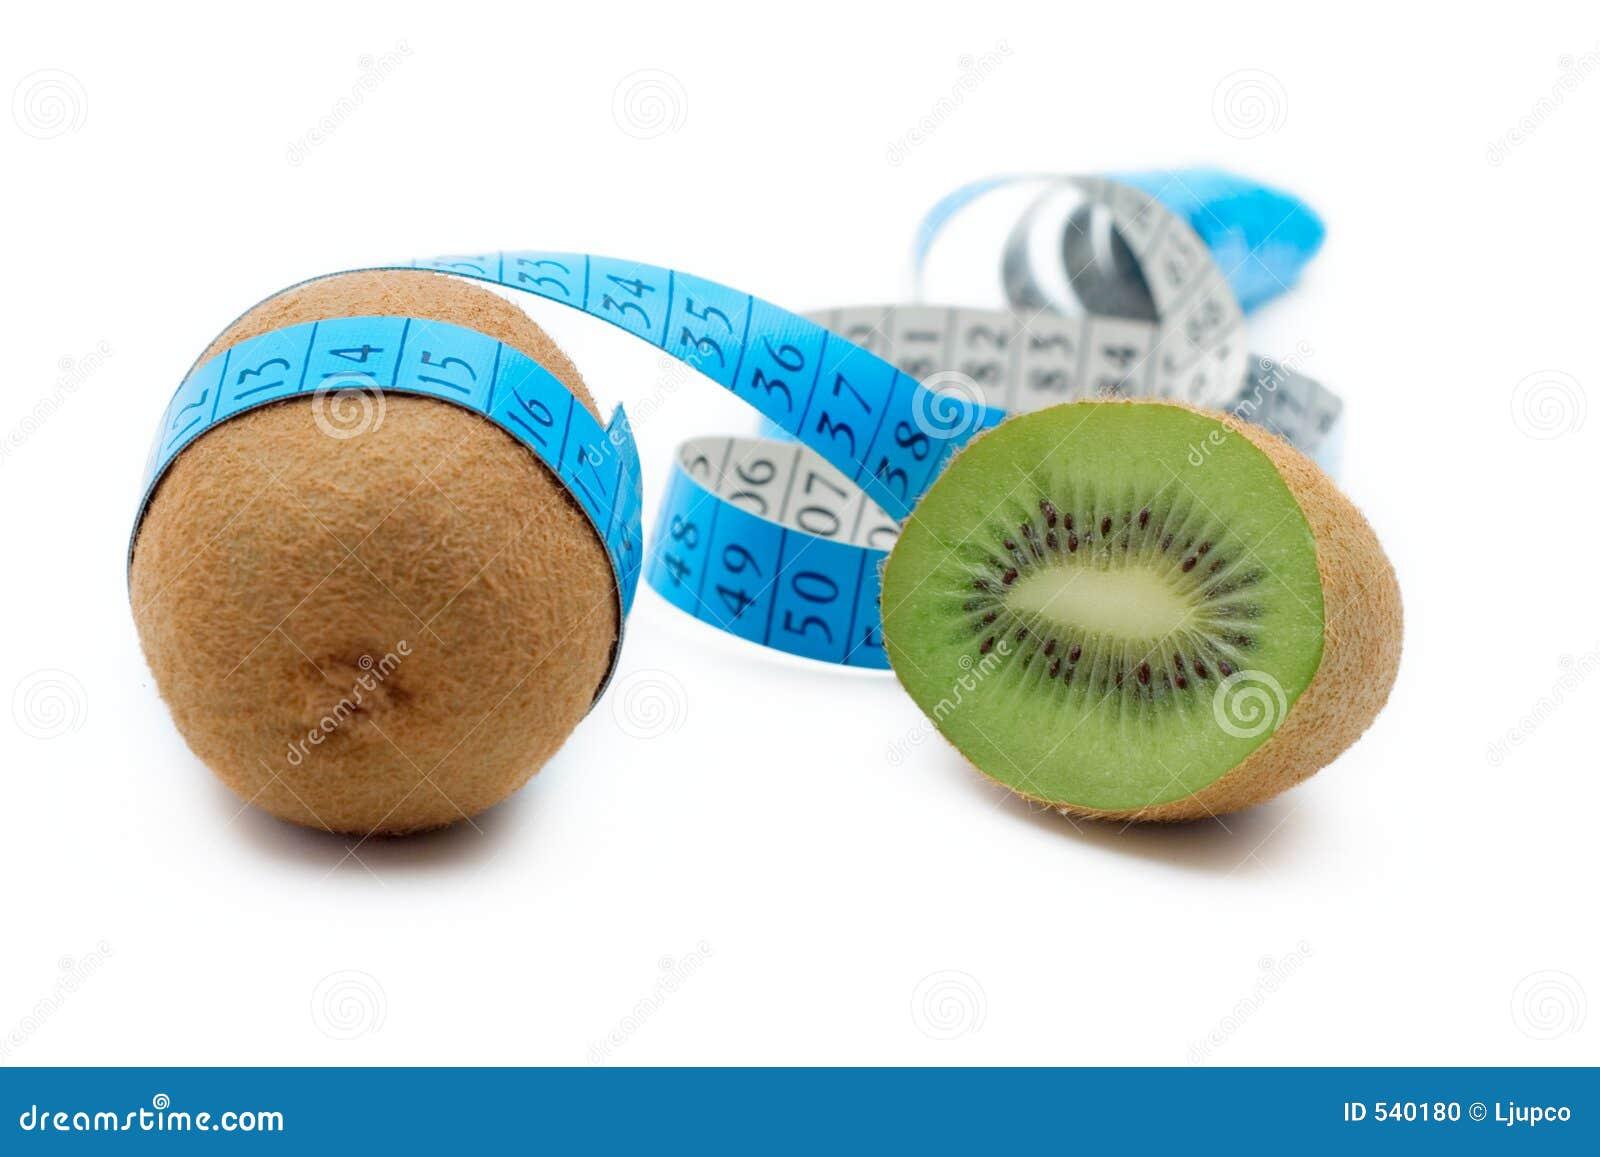 Download 在被包裹的猕猴桃磁带附近 库存照片. 图片 包括有 纤维, 执行, 生气勃勃, 问题的, 饮食, 节食, 自然 - 540180